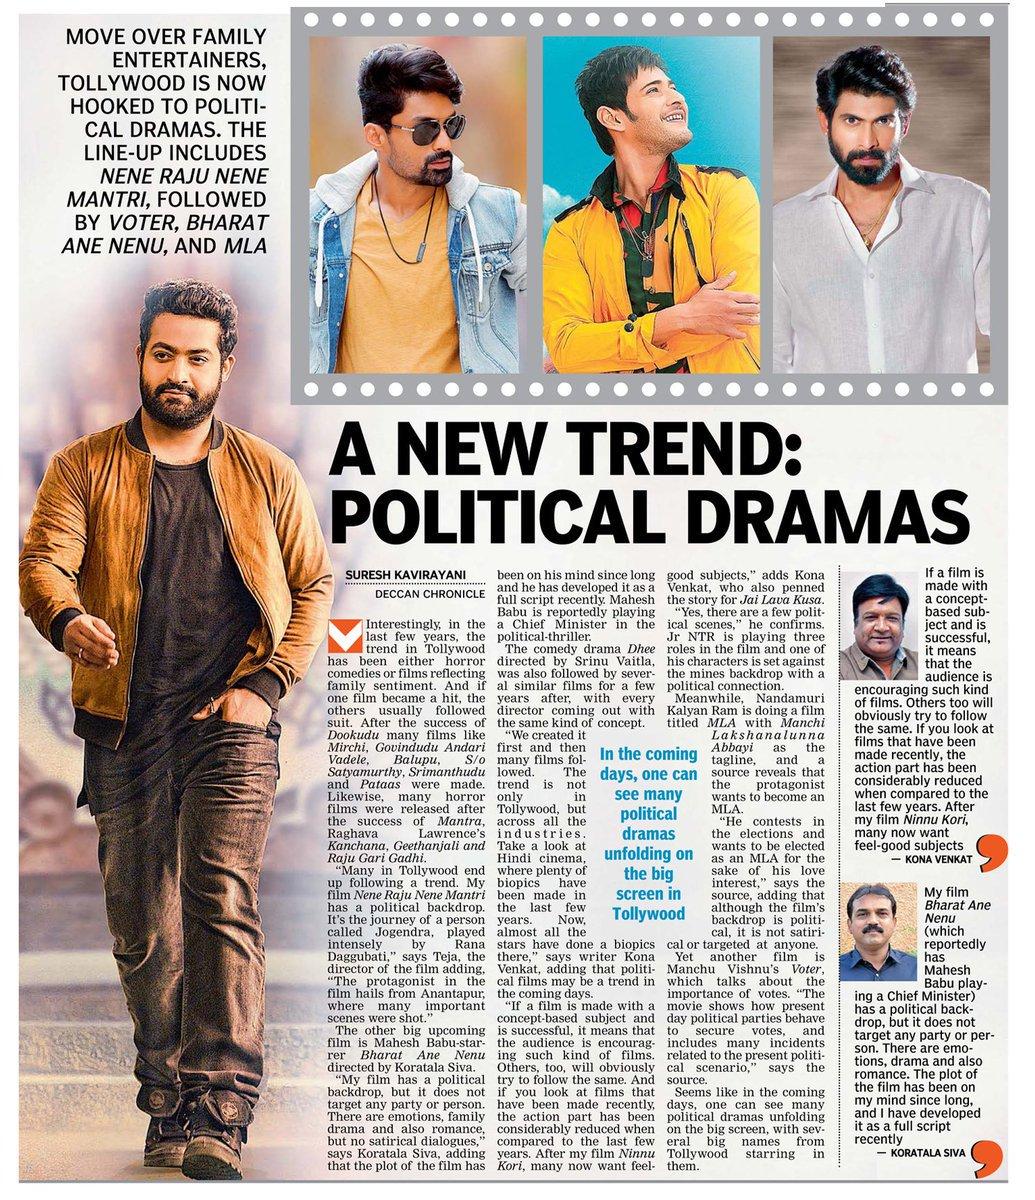 PrintMedia Article about  Political Movies TRENE in T&#39;Town  @tarak9999 - #JaiLavakusa  @NANDAMURIKALYAN - #MLA <br>http://pic.twitter.com/769f8mTunu